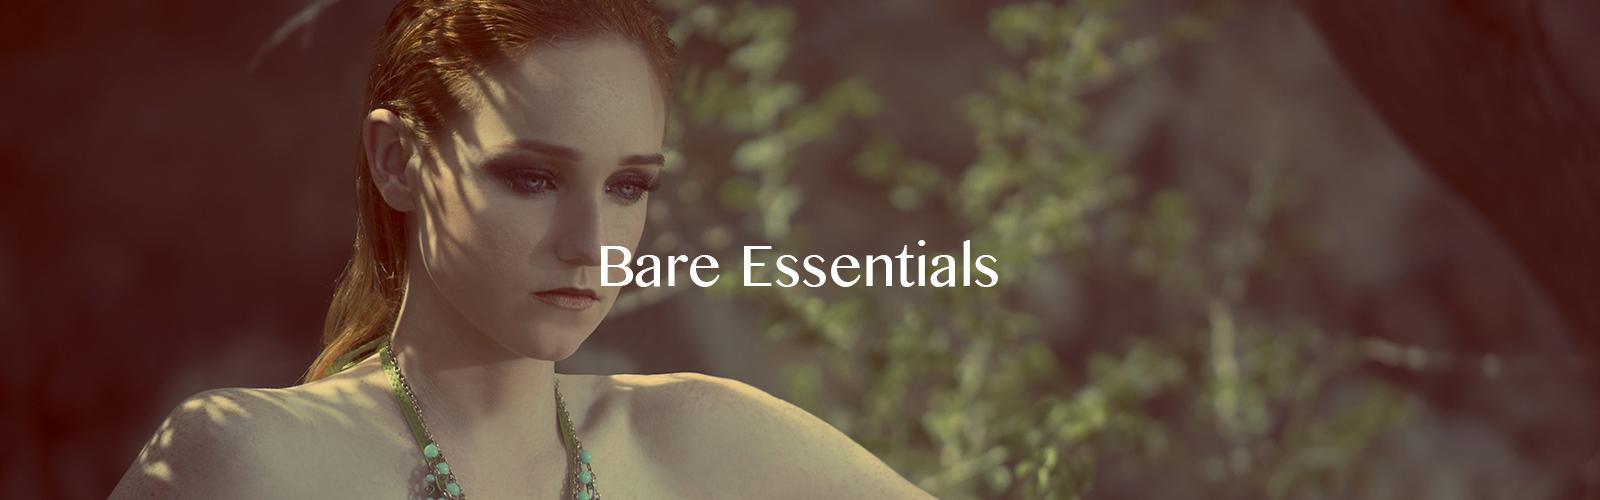 Bare Essentials-1600-new site